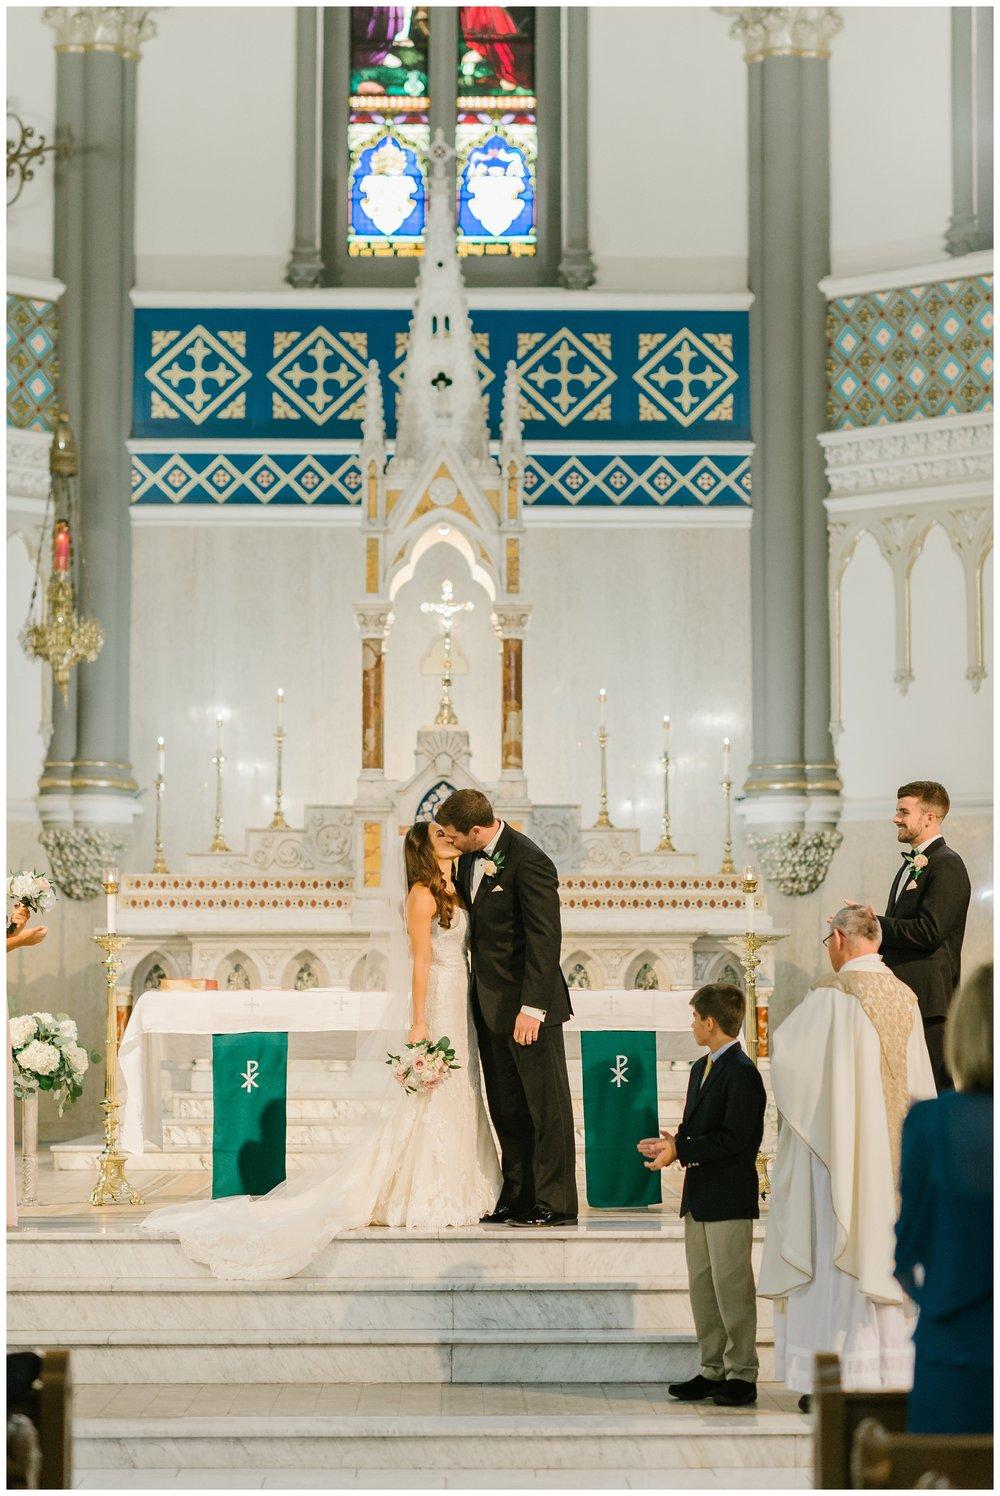 Rebecca_Bridges_Photography_Indianapolis_Wedding_Photographer_6809.jpg